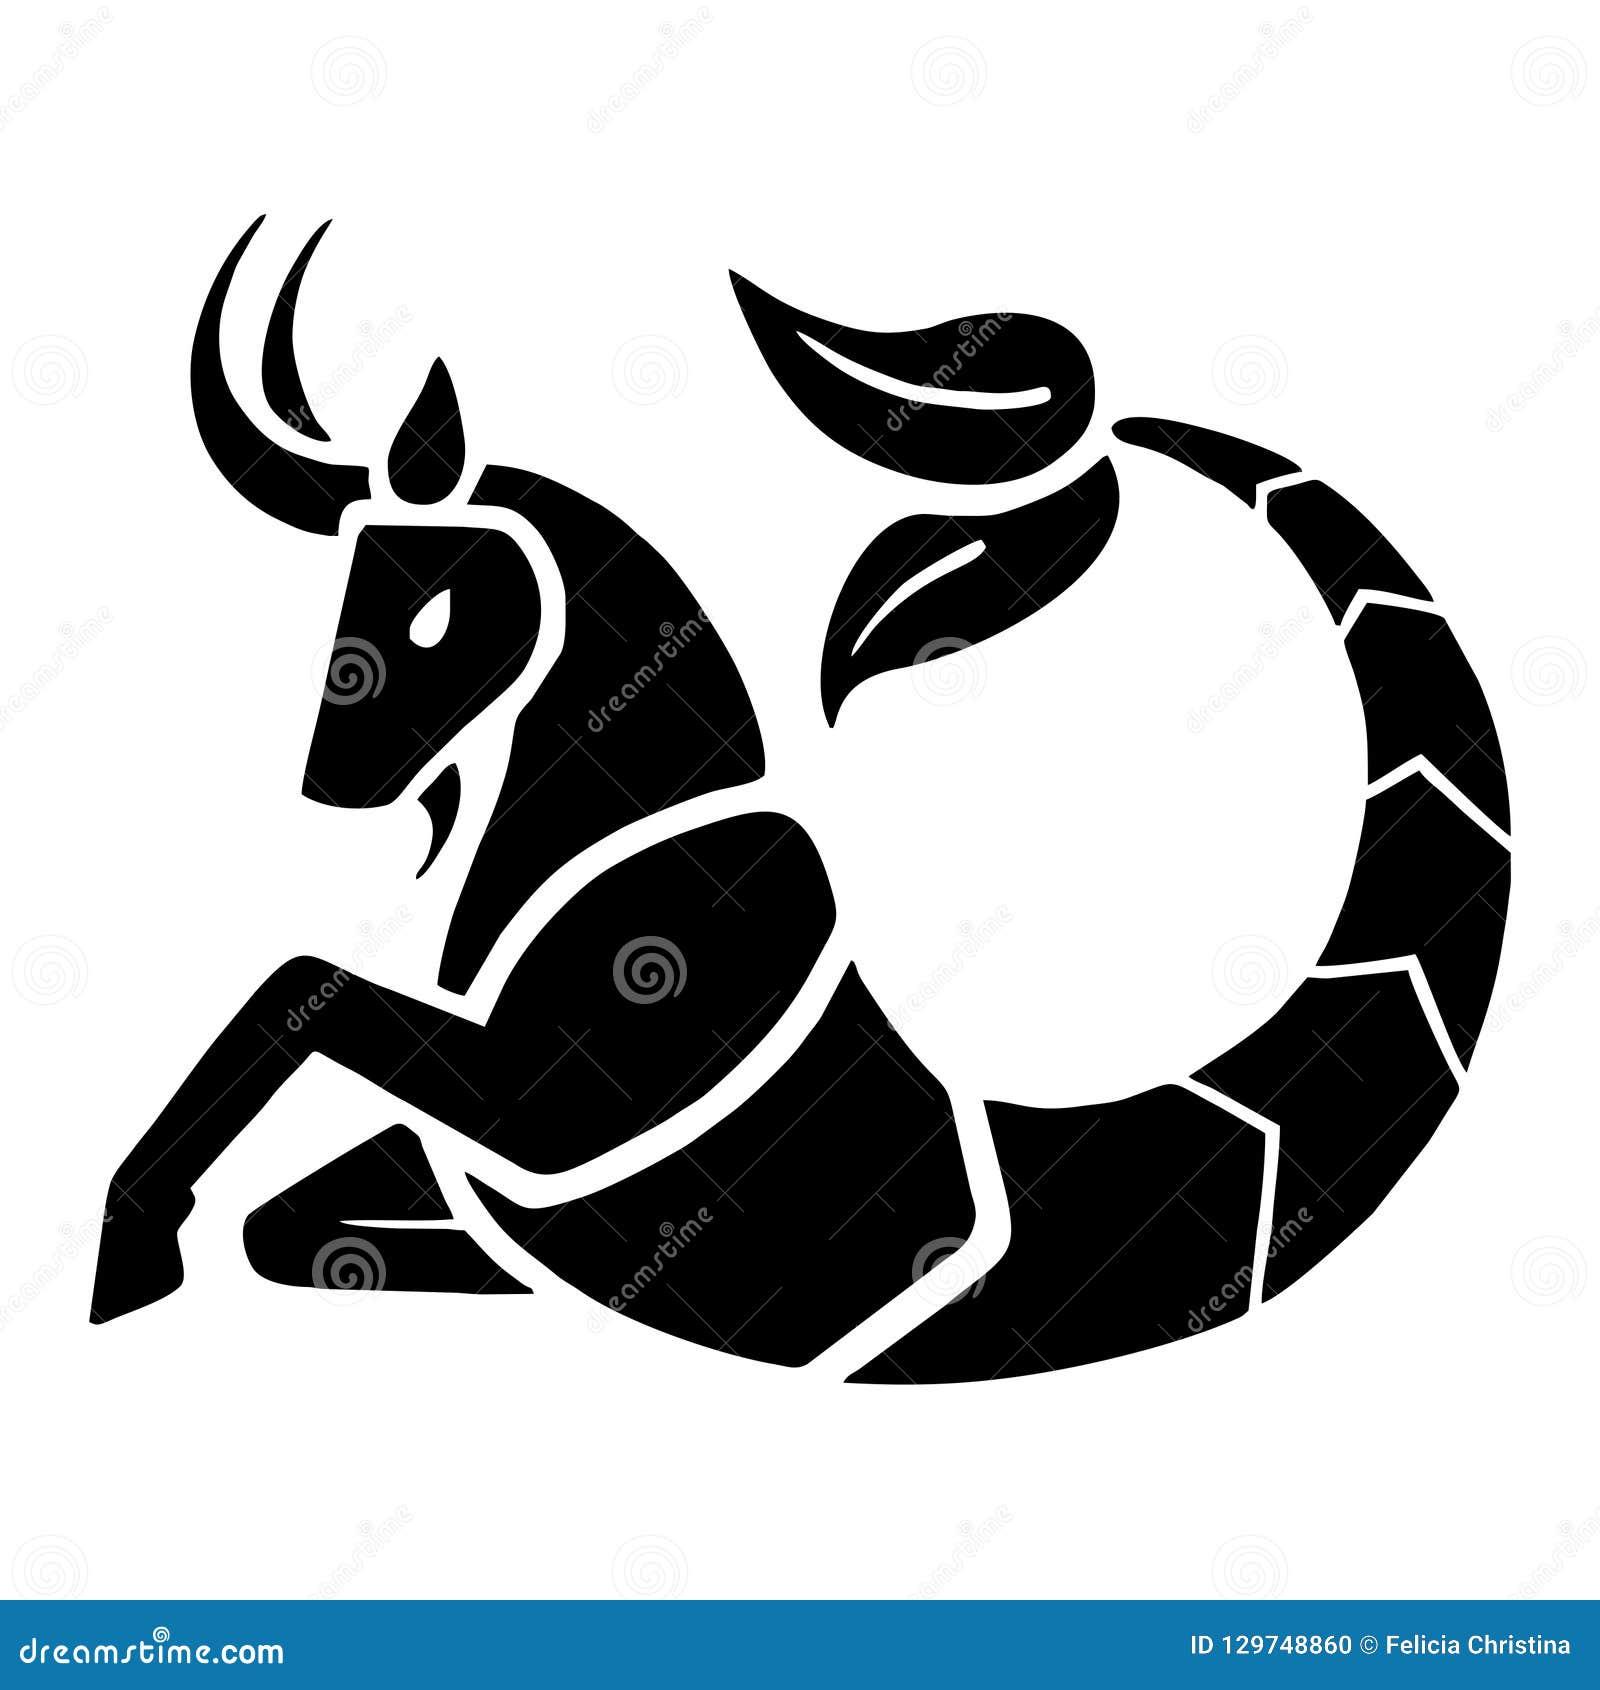 Symbols Capricorn Stock Illustrations – 3,668 Symbols Capricorn Stock  Illustrations, Vectors & Clipart - Dreamstime